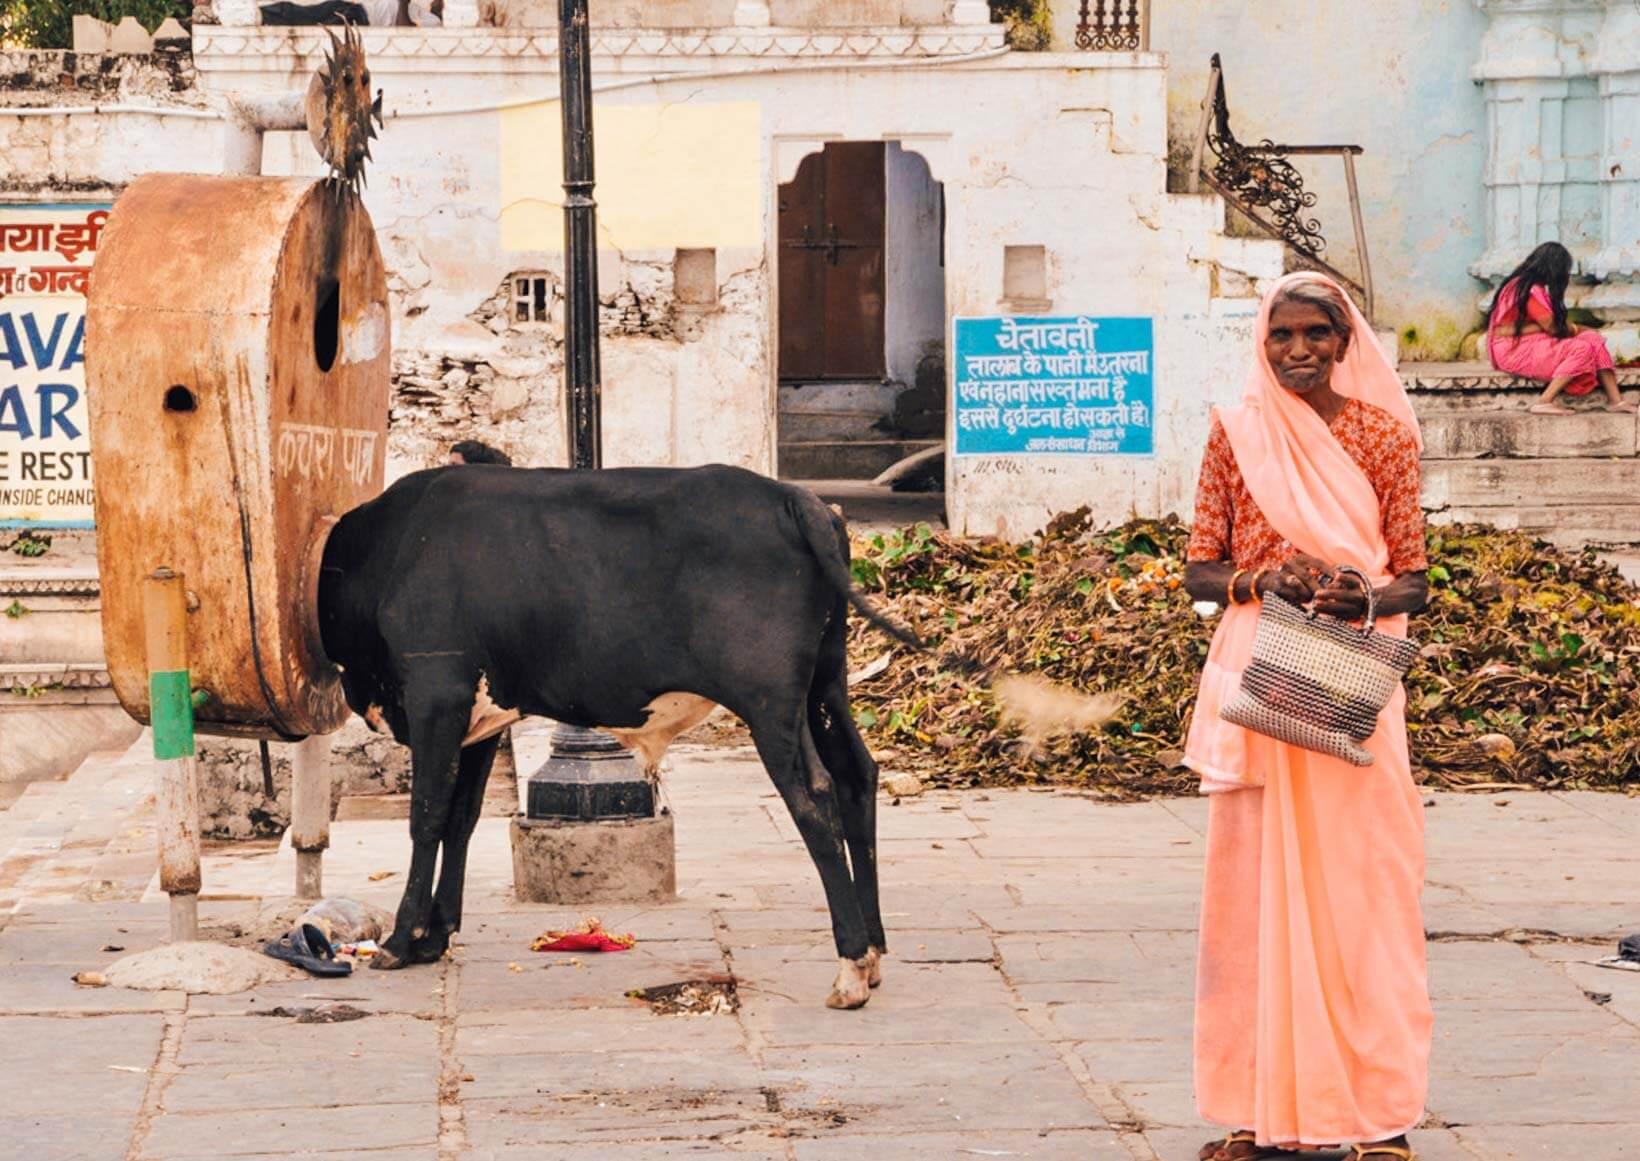 Rajasthan luoghi di interesse Udaipur